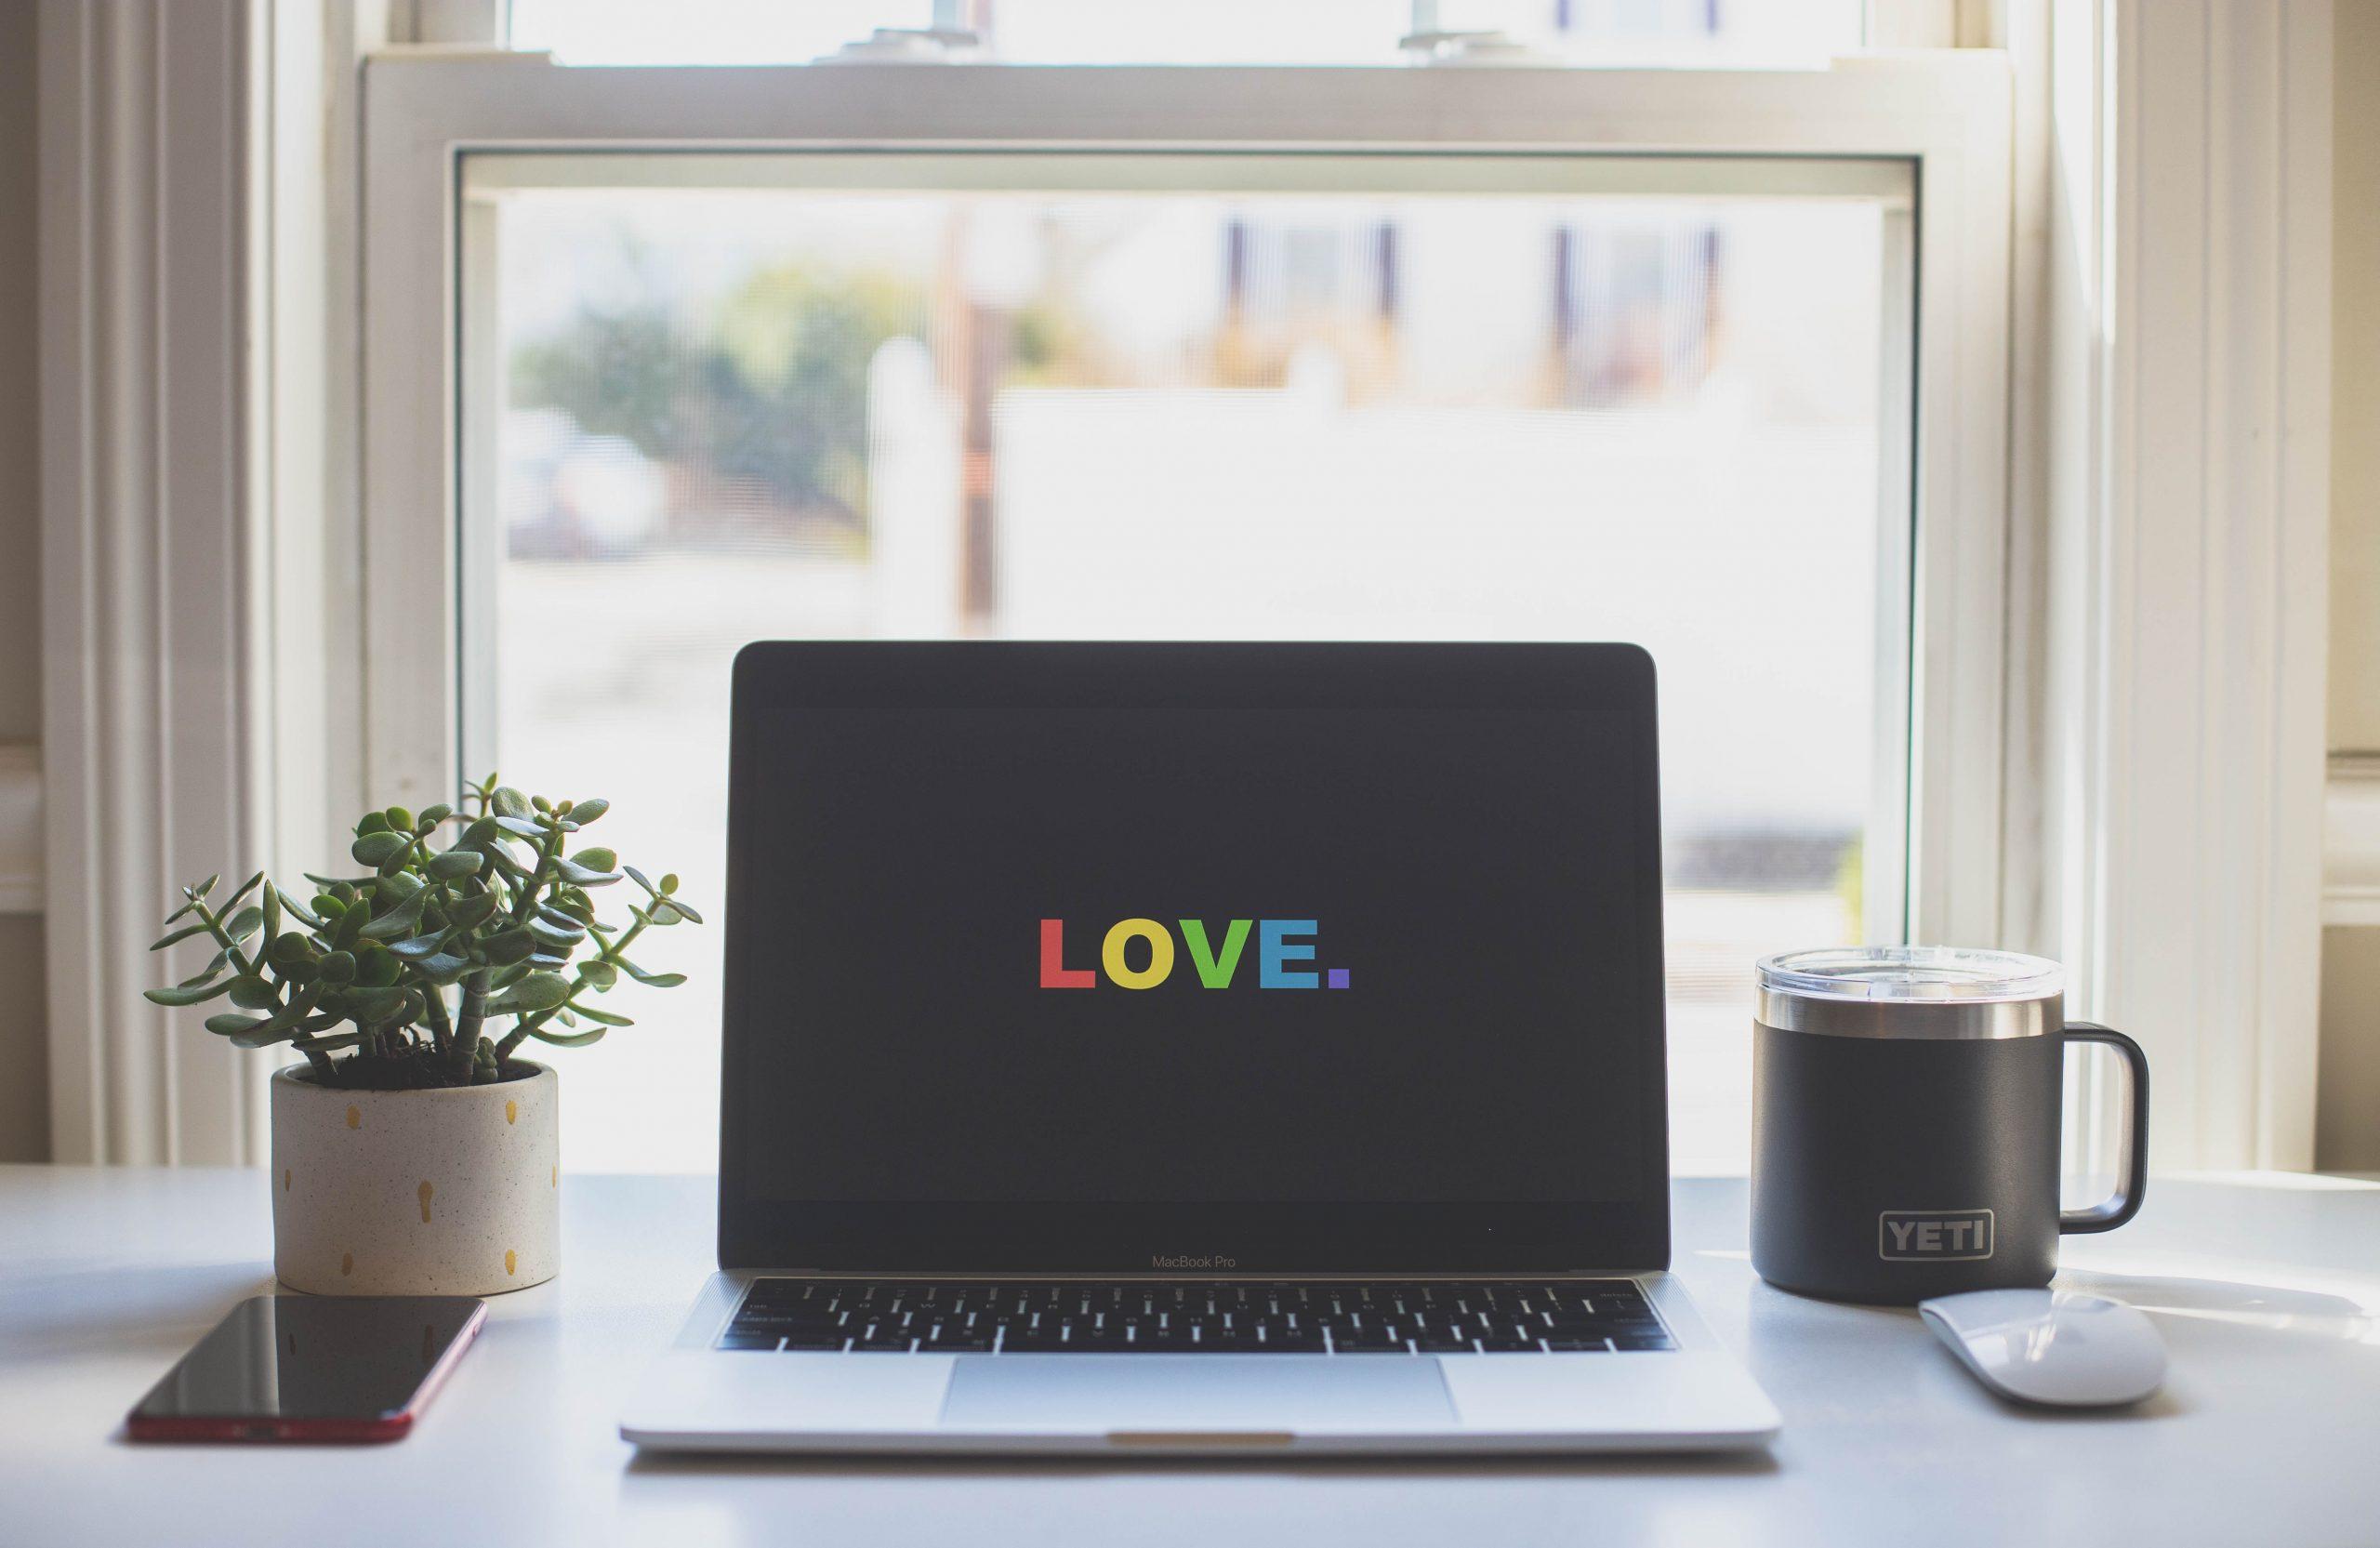 Love tech computador amor dating